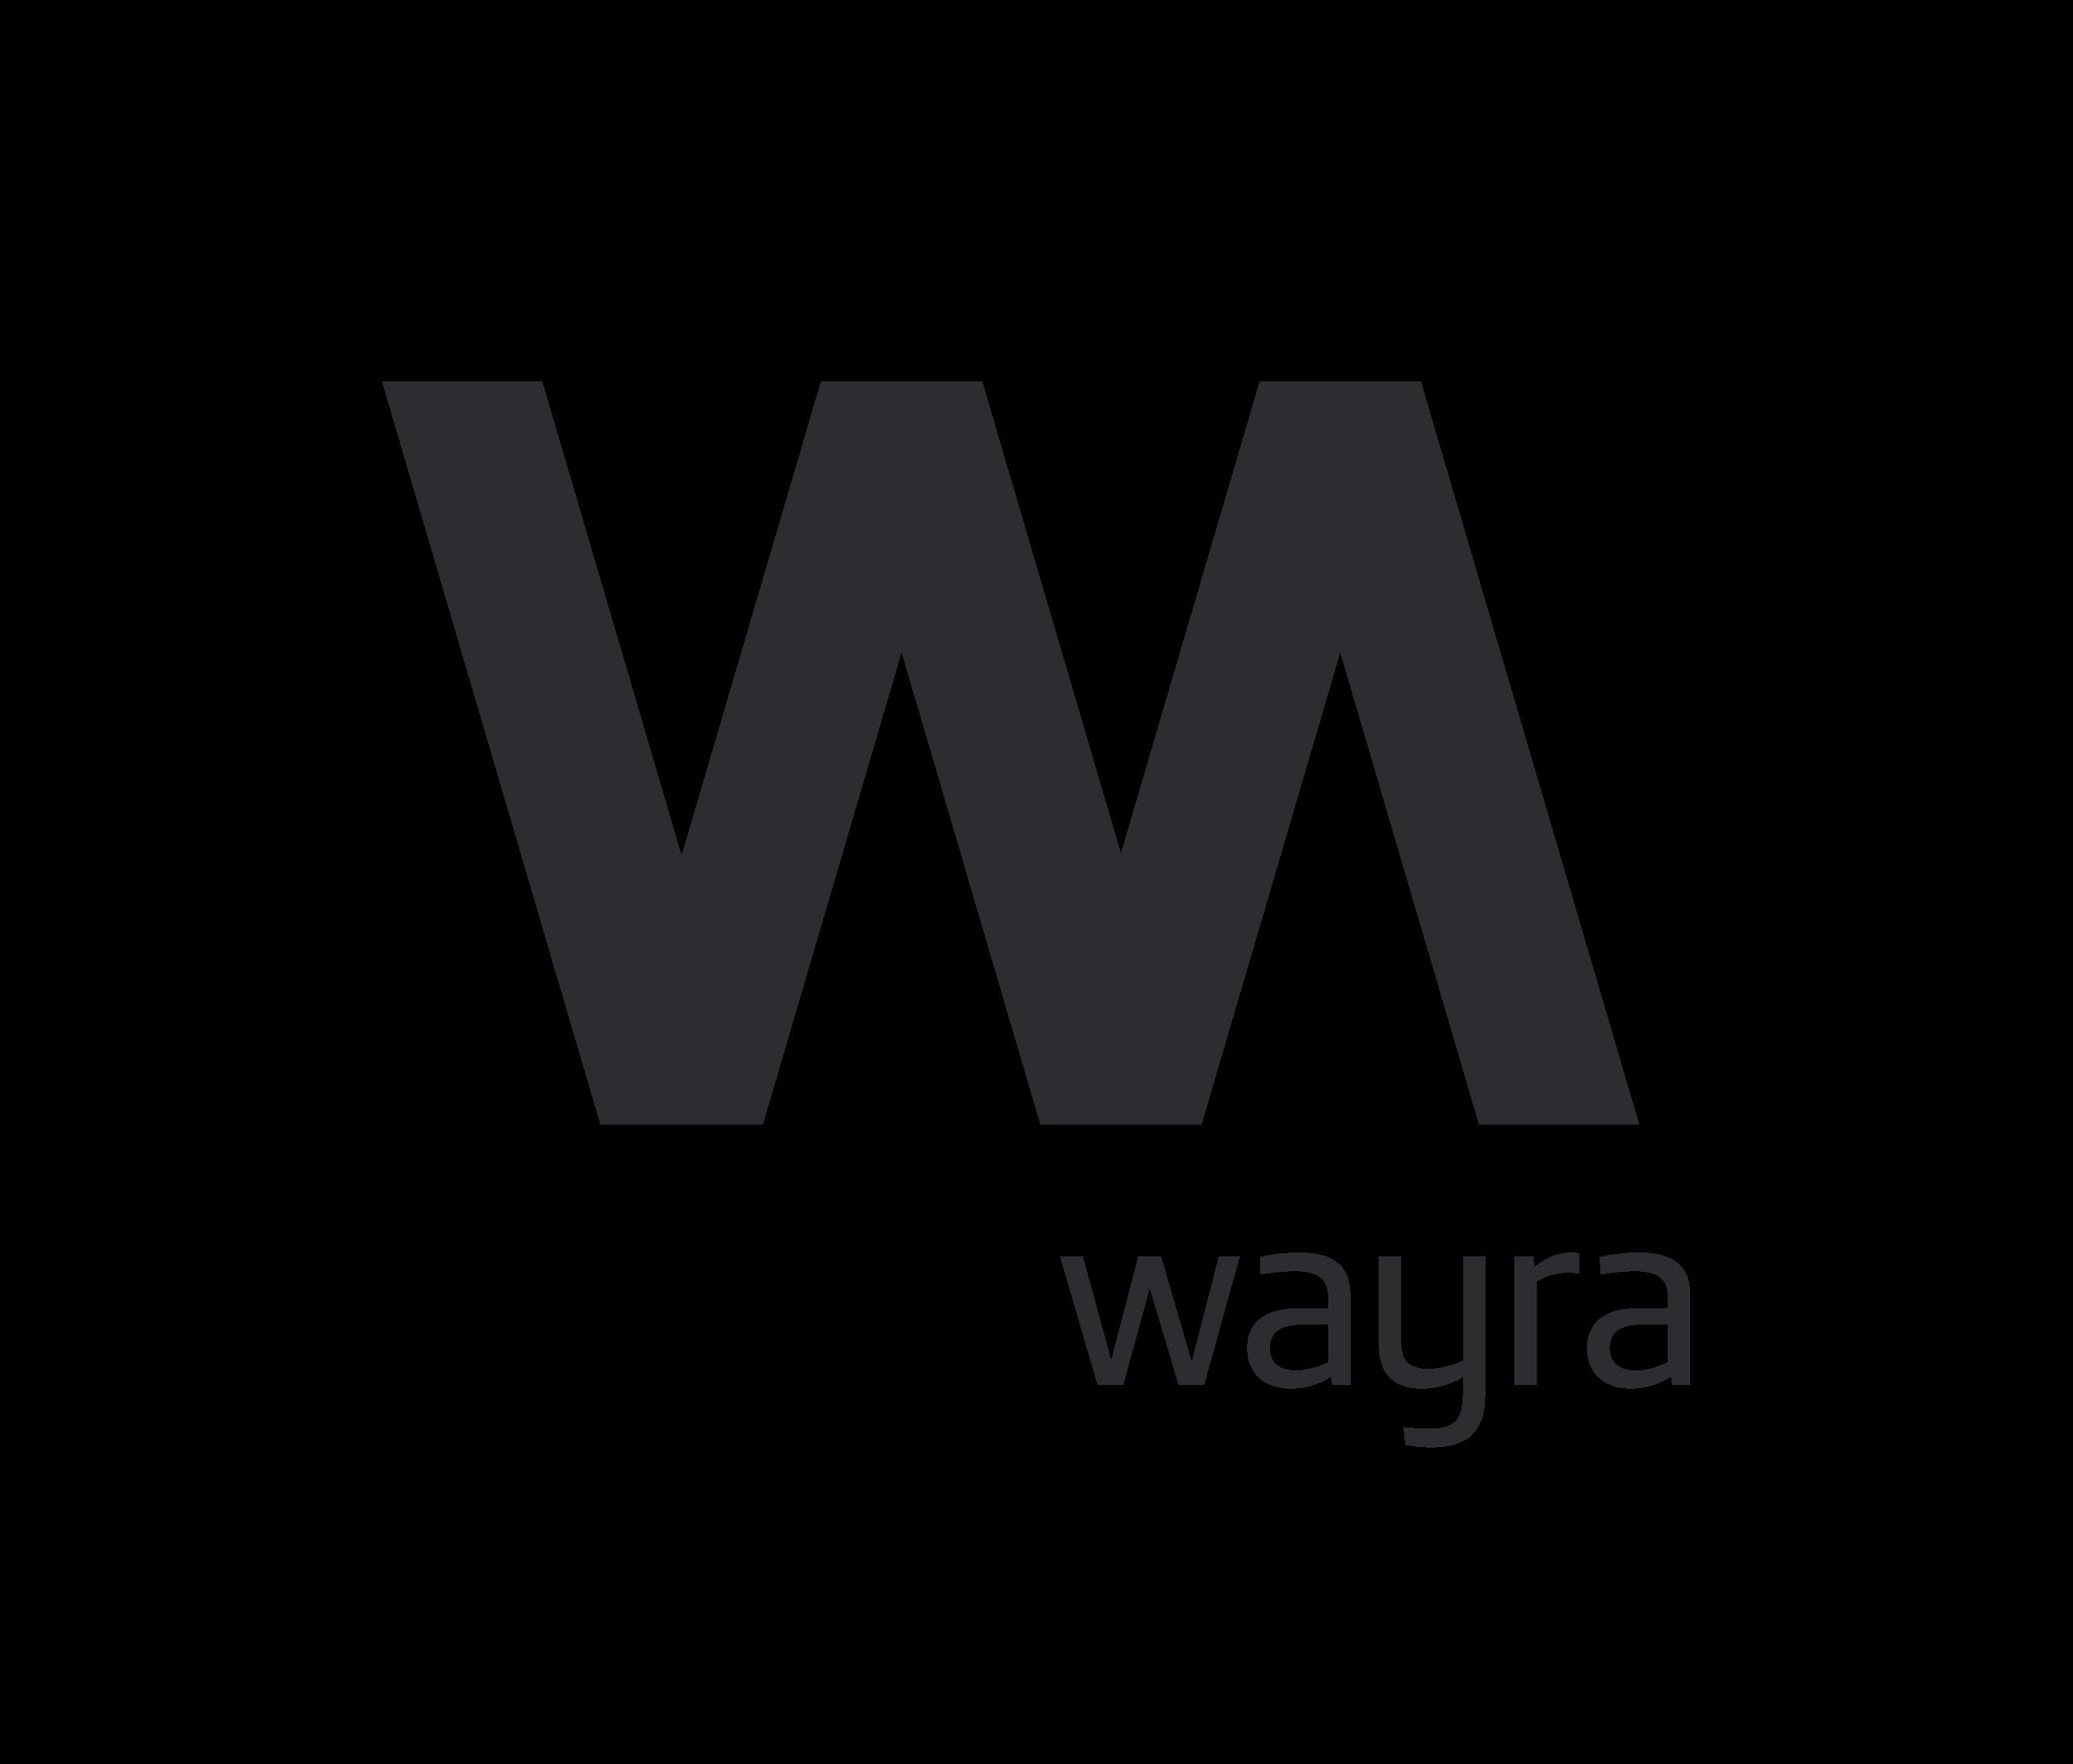 Wayra. Global Incubator's clients